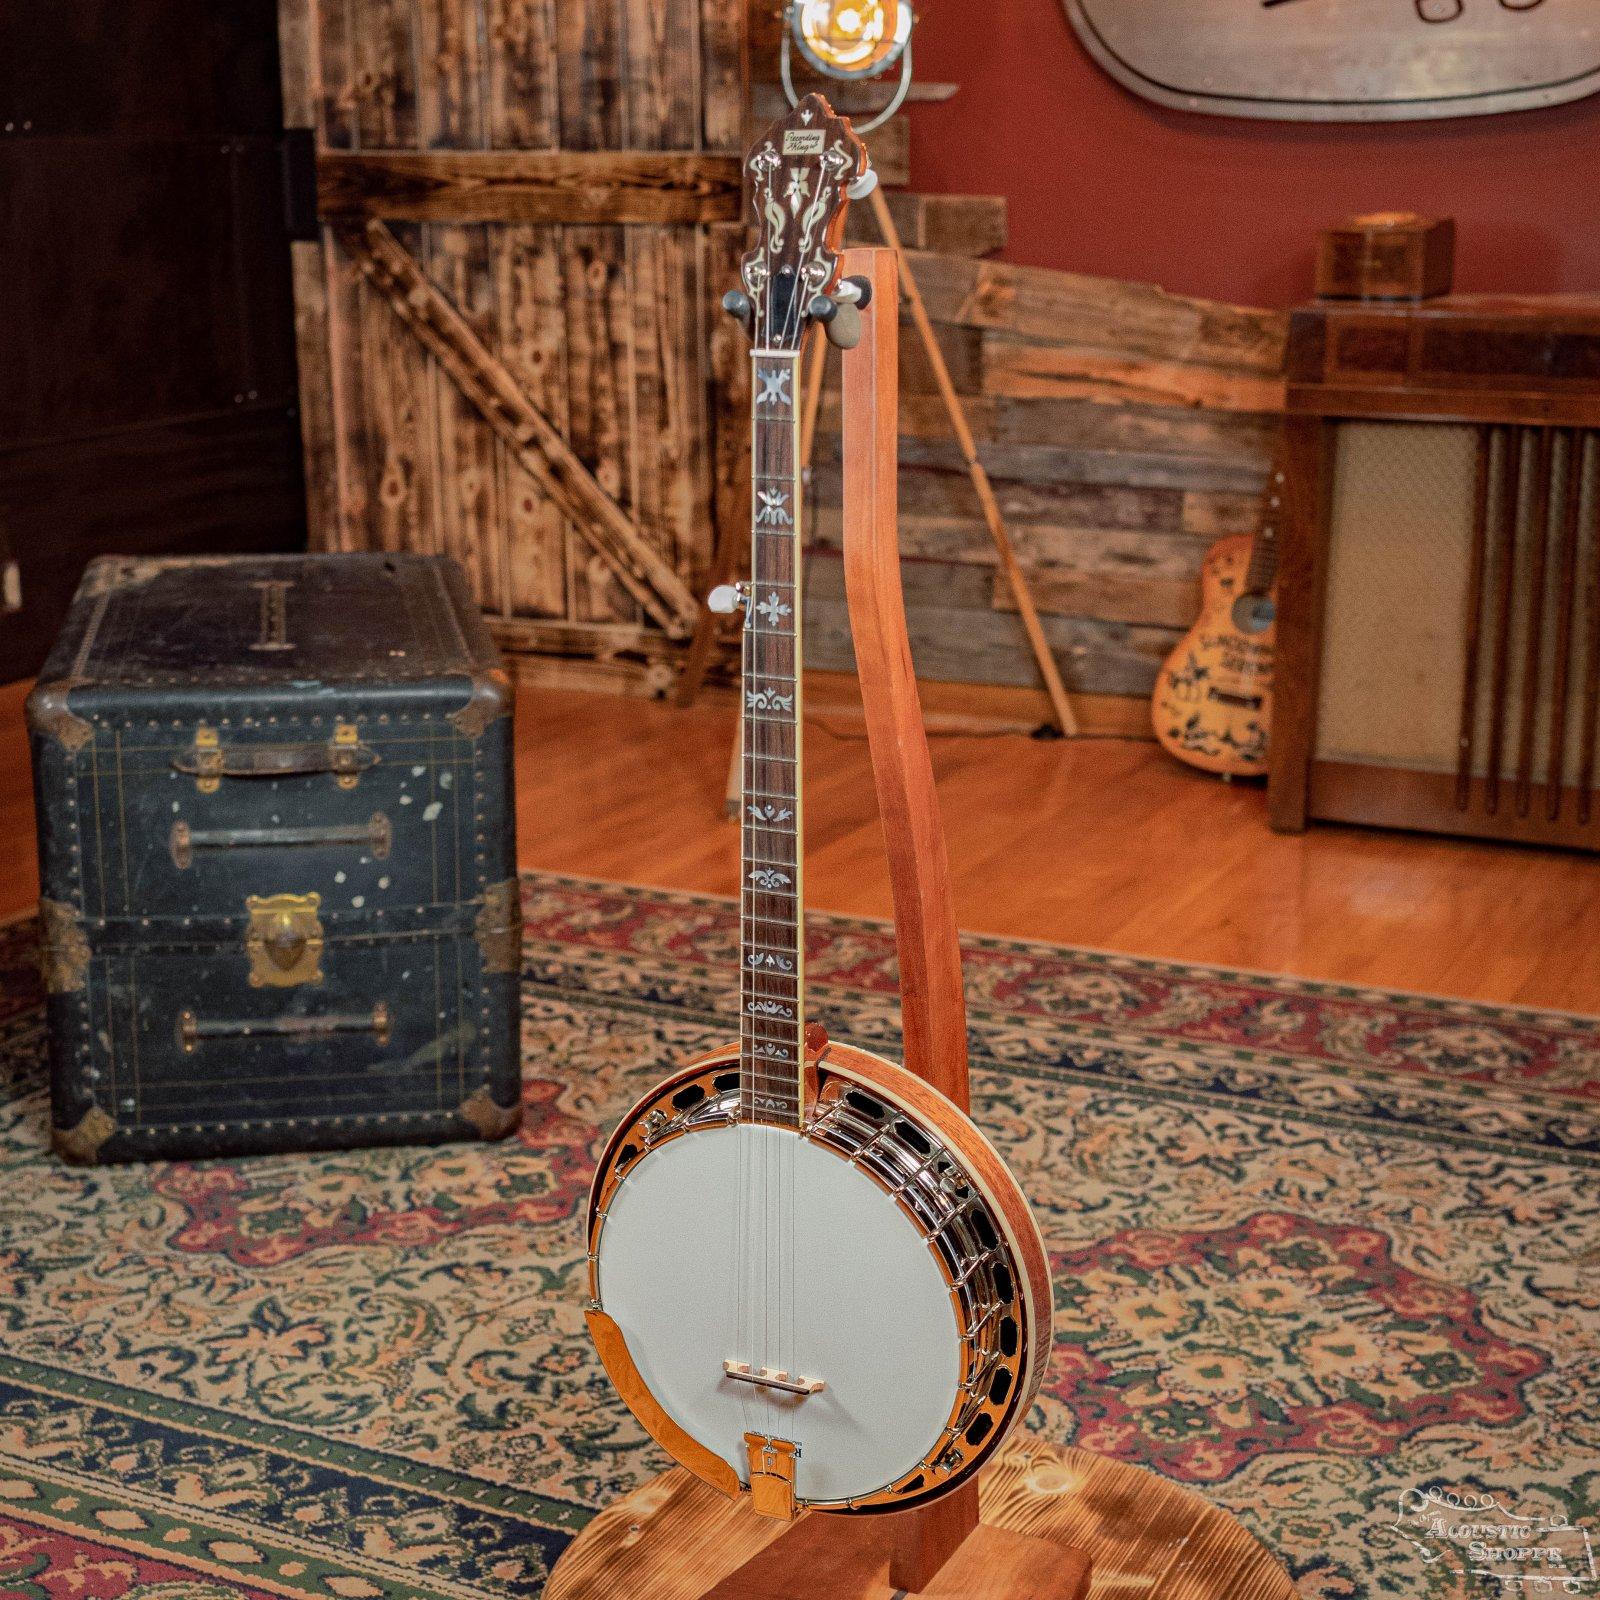 Recording King RK-ELITE-75 The Elite Flying Eagle Resonator Banjo #0254